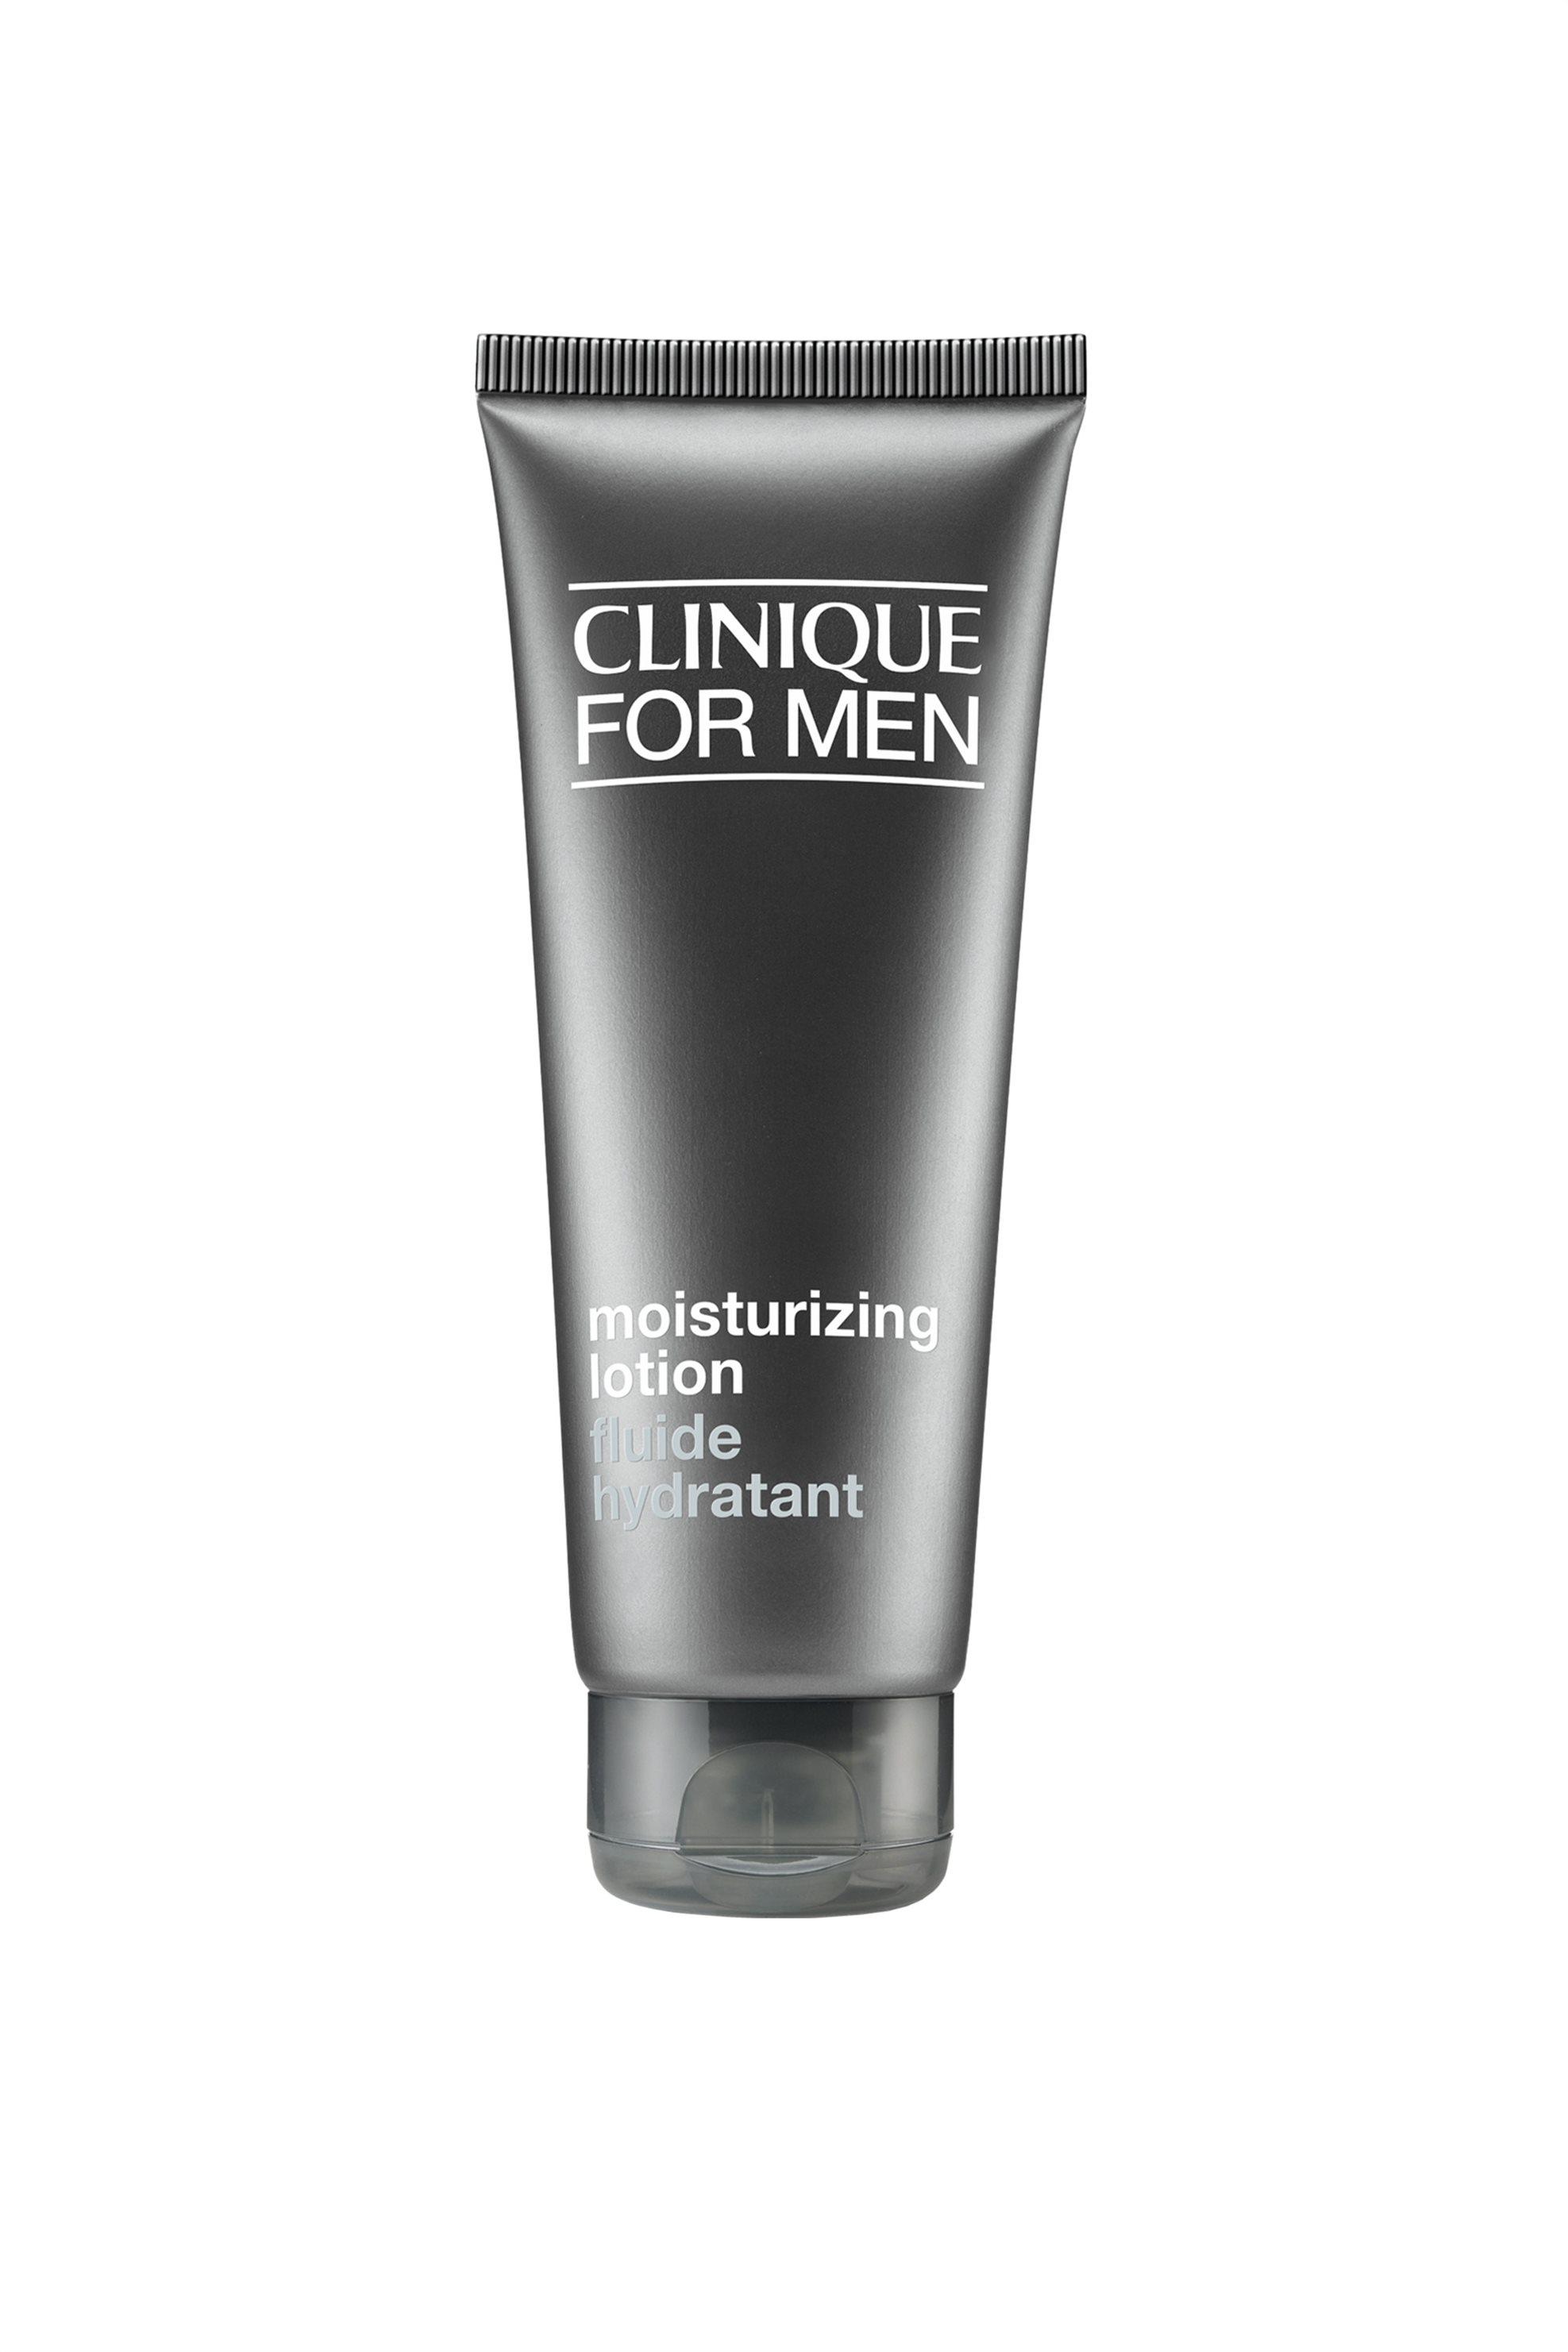 Clinique Clinique For Men™ Moisturizing Lotion 100 ml - Z219010000 ομορφια   καλλυντικα επιλεκτικησ   ανδρική περιποίηση   περιποίηση προσώπου